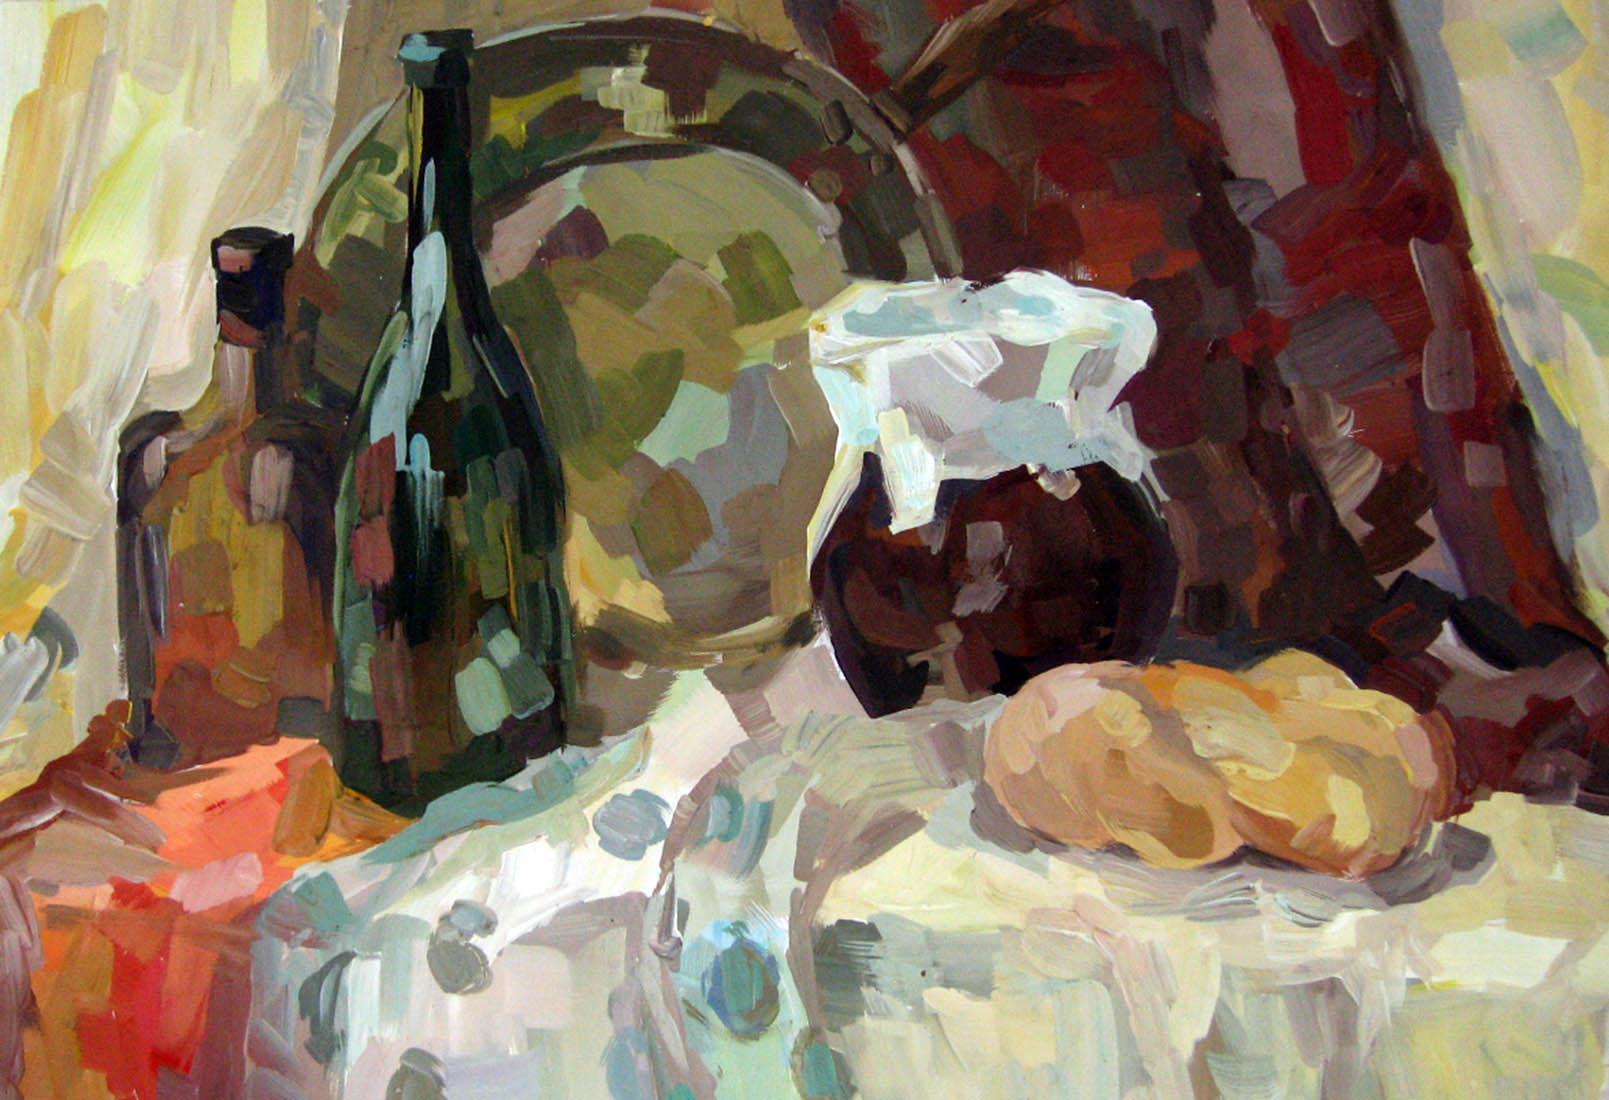 Polina-Shubkina-Paintings-020.jpg